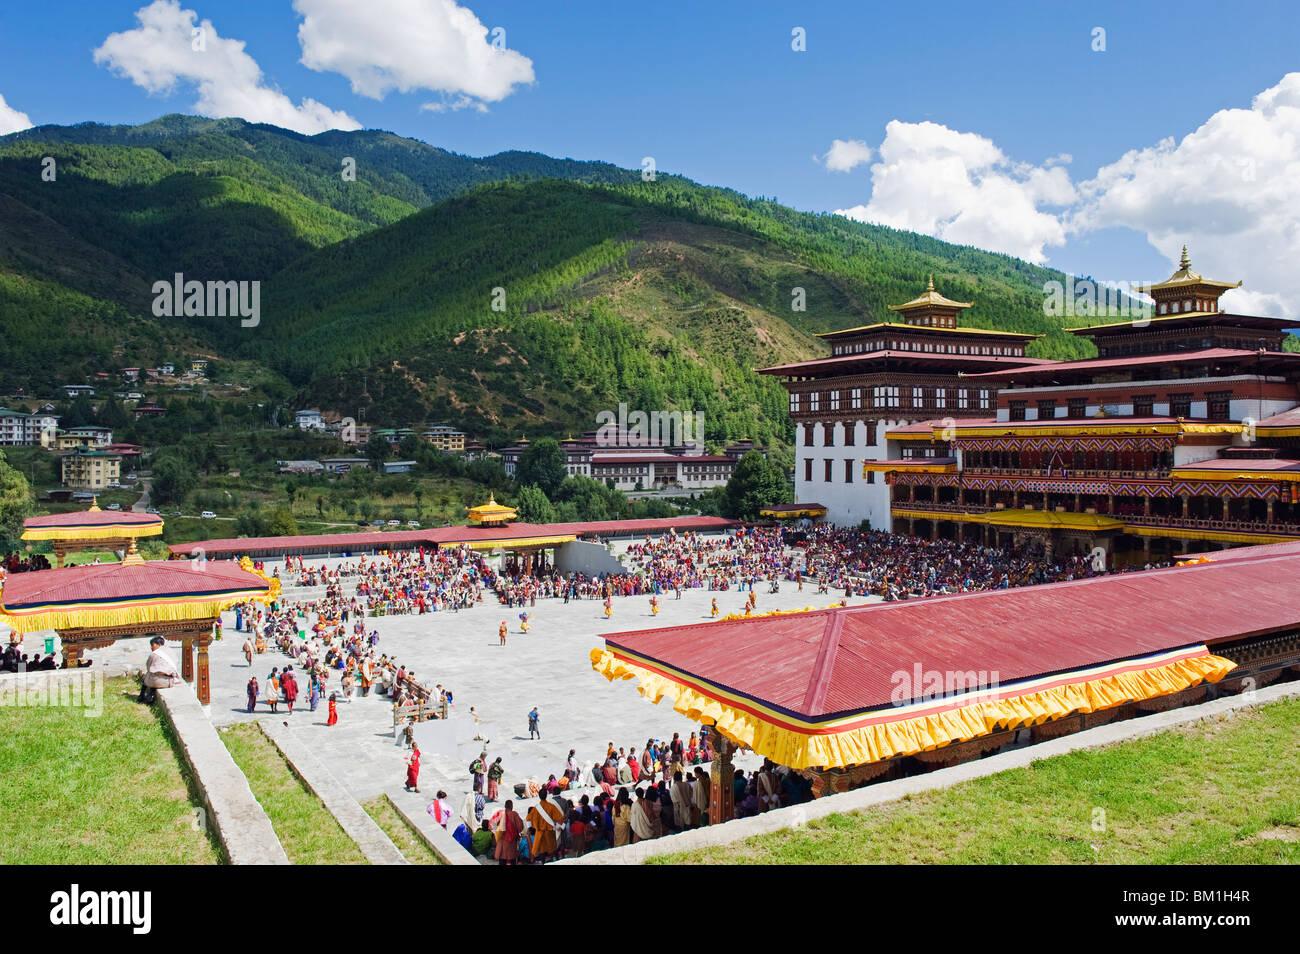 Automne Tsechu (festival) à Trashi Chhoe Dzong, Thimphu, Bhoutan, Asie Photo Stock